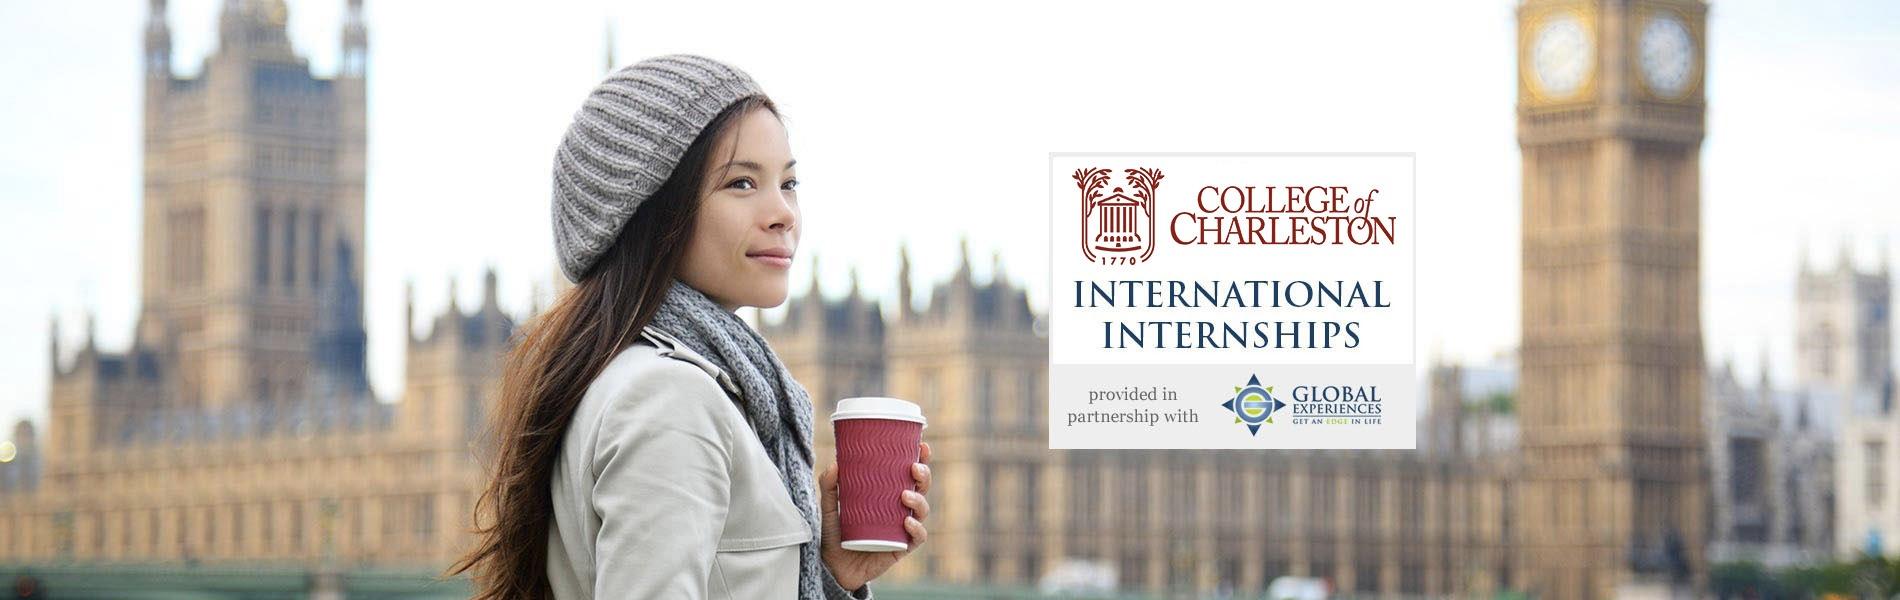 college of charleston intern abroad